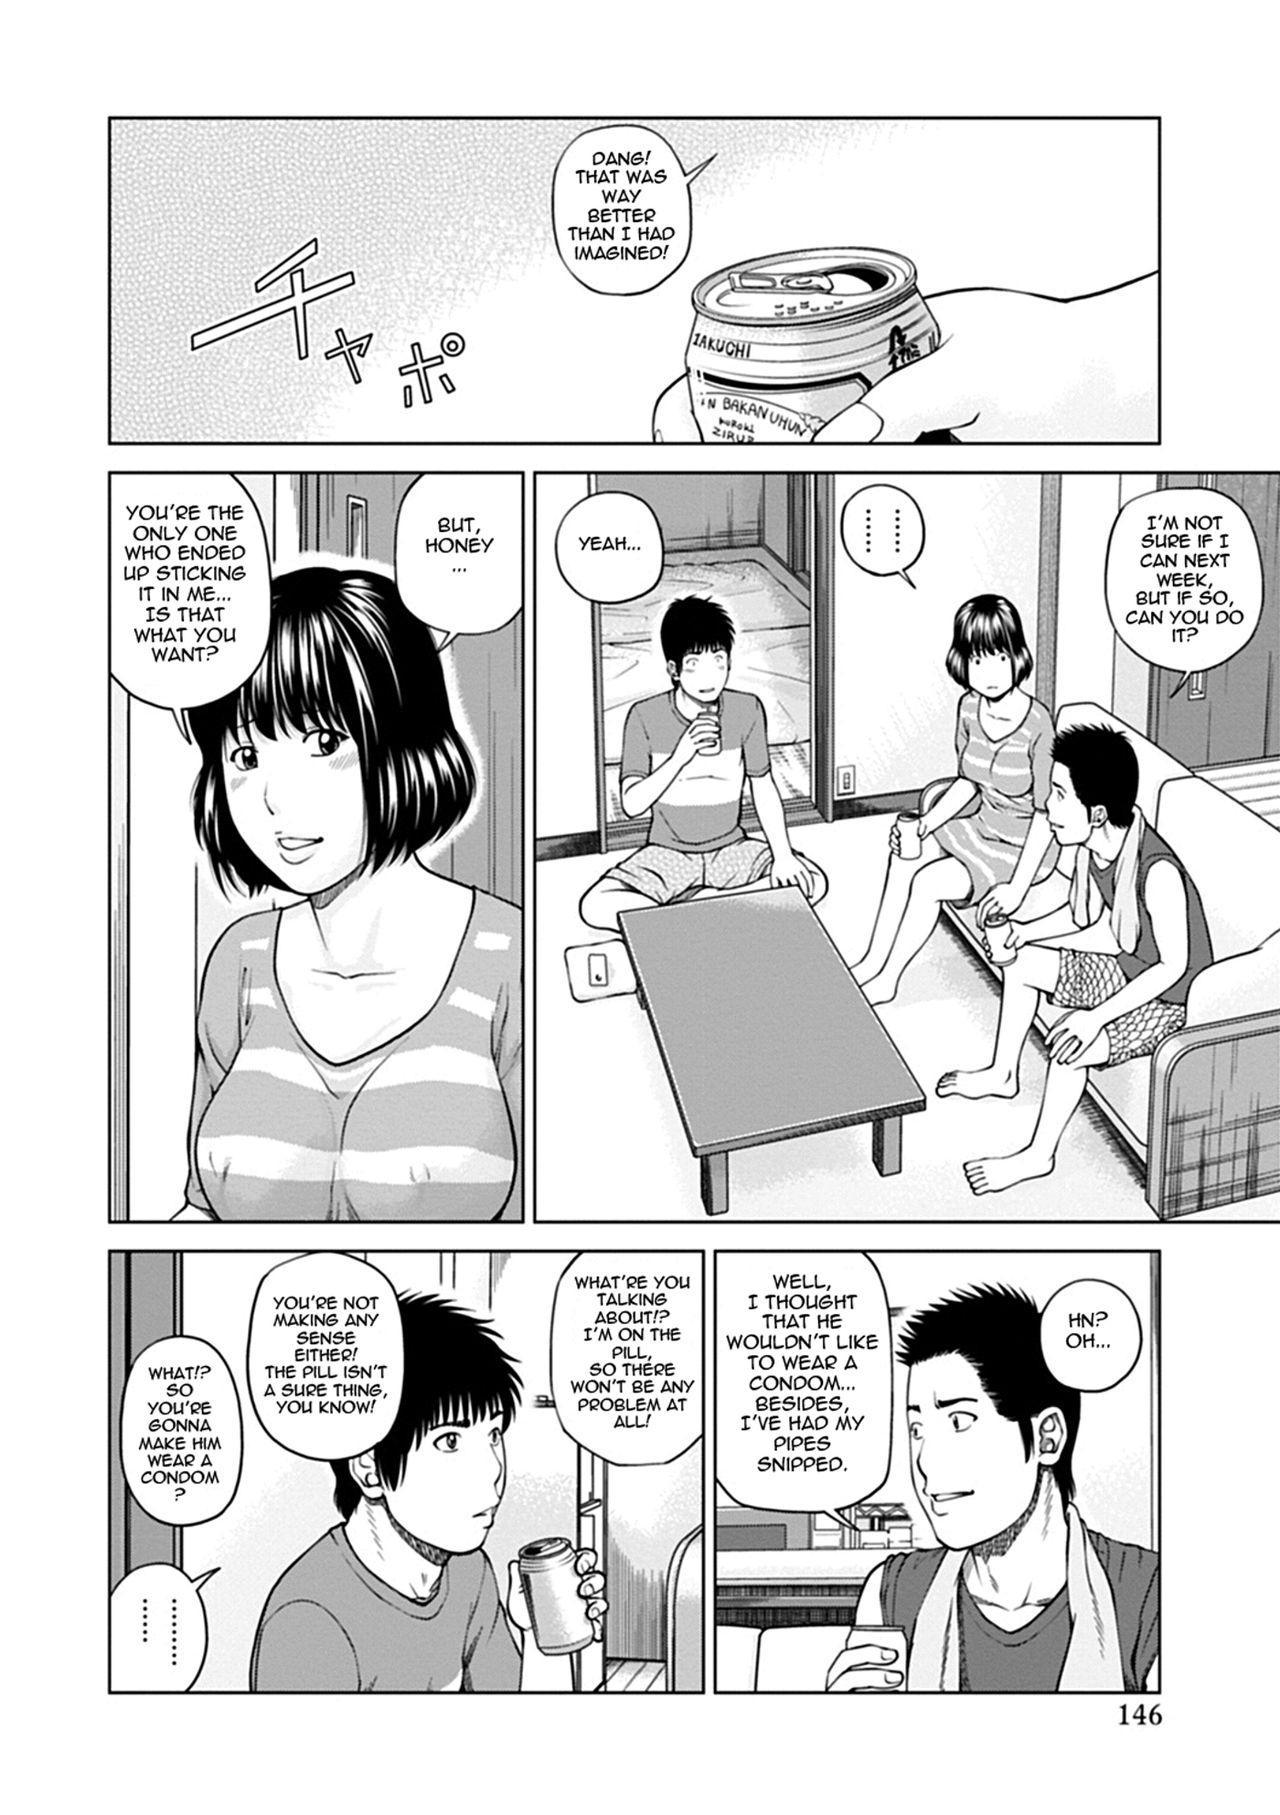 [Kuroki Hidehiko] 36-sai Injuku Sakarizuma | 36-Year-Old Randy Mature Wife [English] {Tadanohito} [Digital] [Uncensored] 139